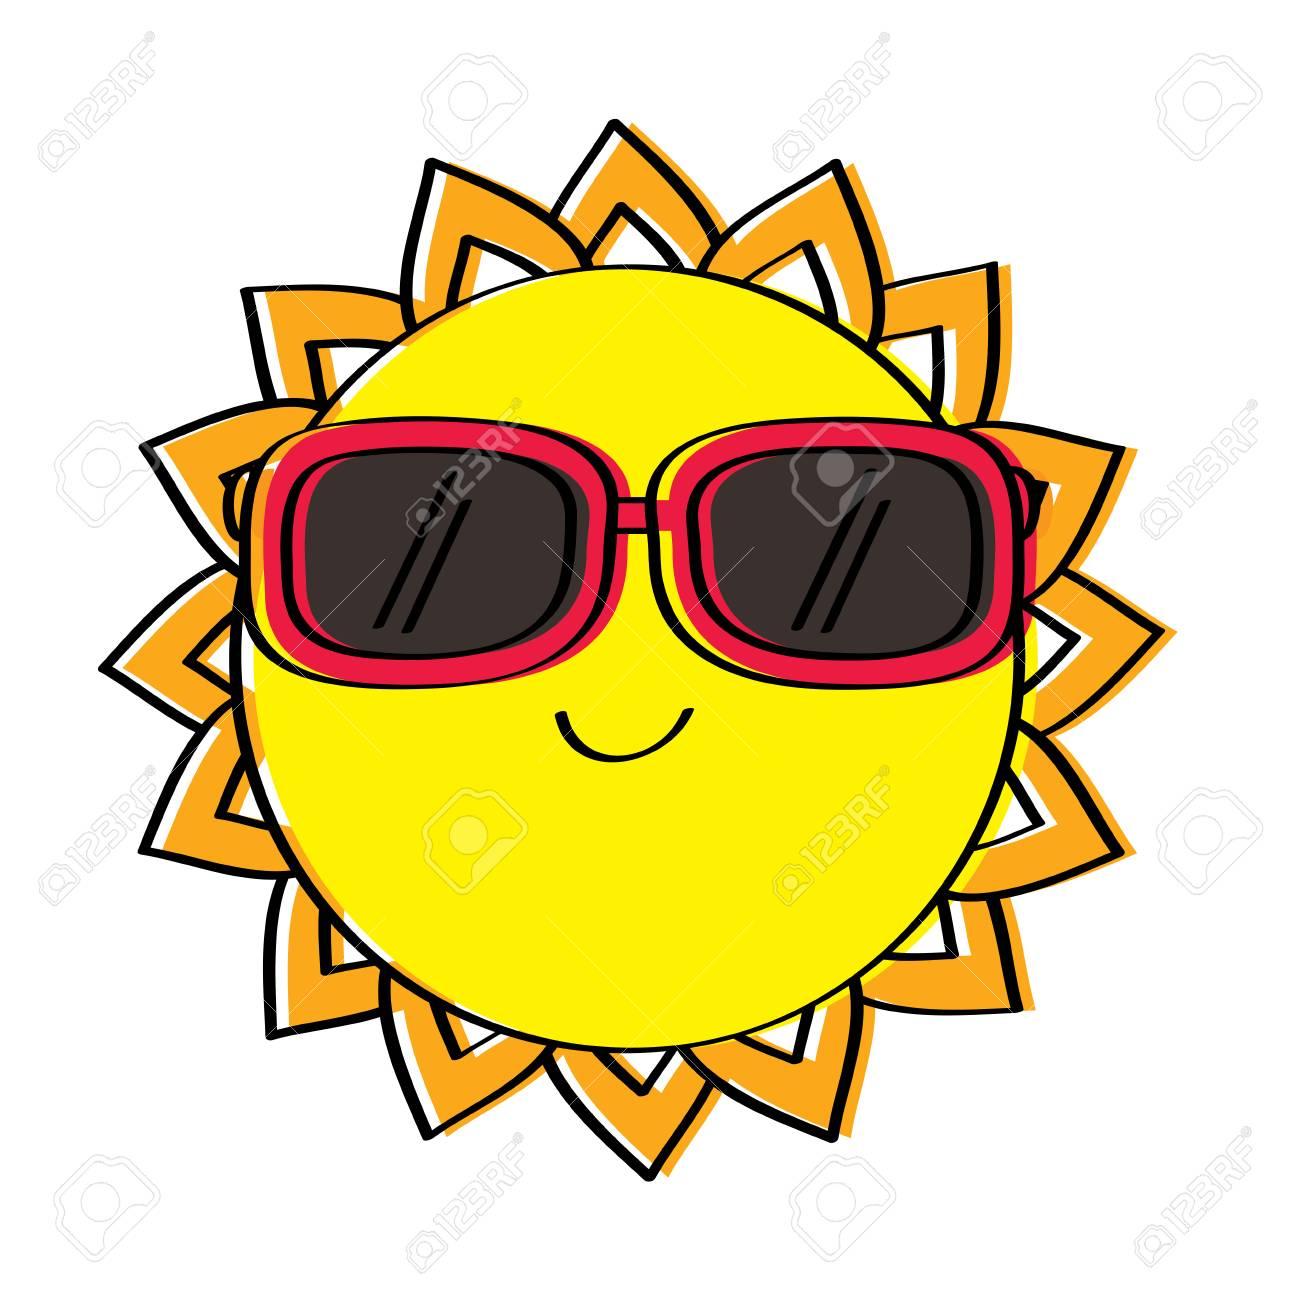 4f9dbeaecf cartoon sun wearing sunglasses summer character vector illustration Stock  Vector - 95335982